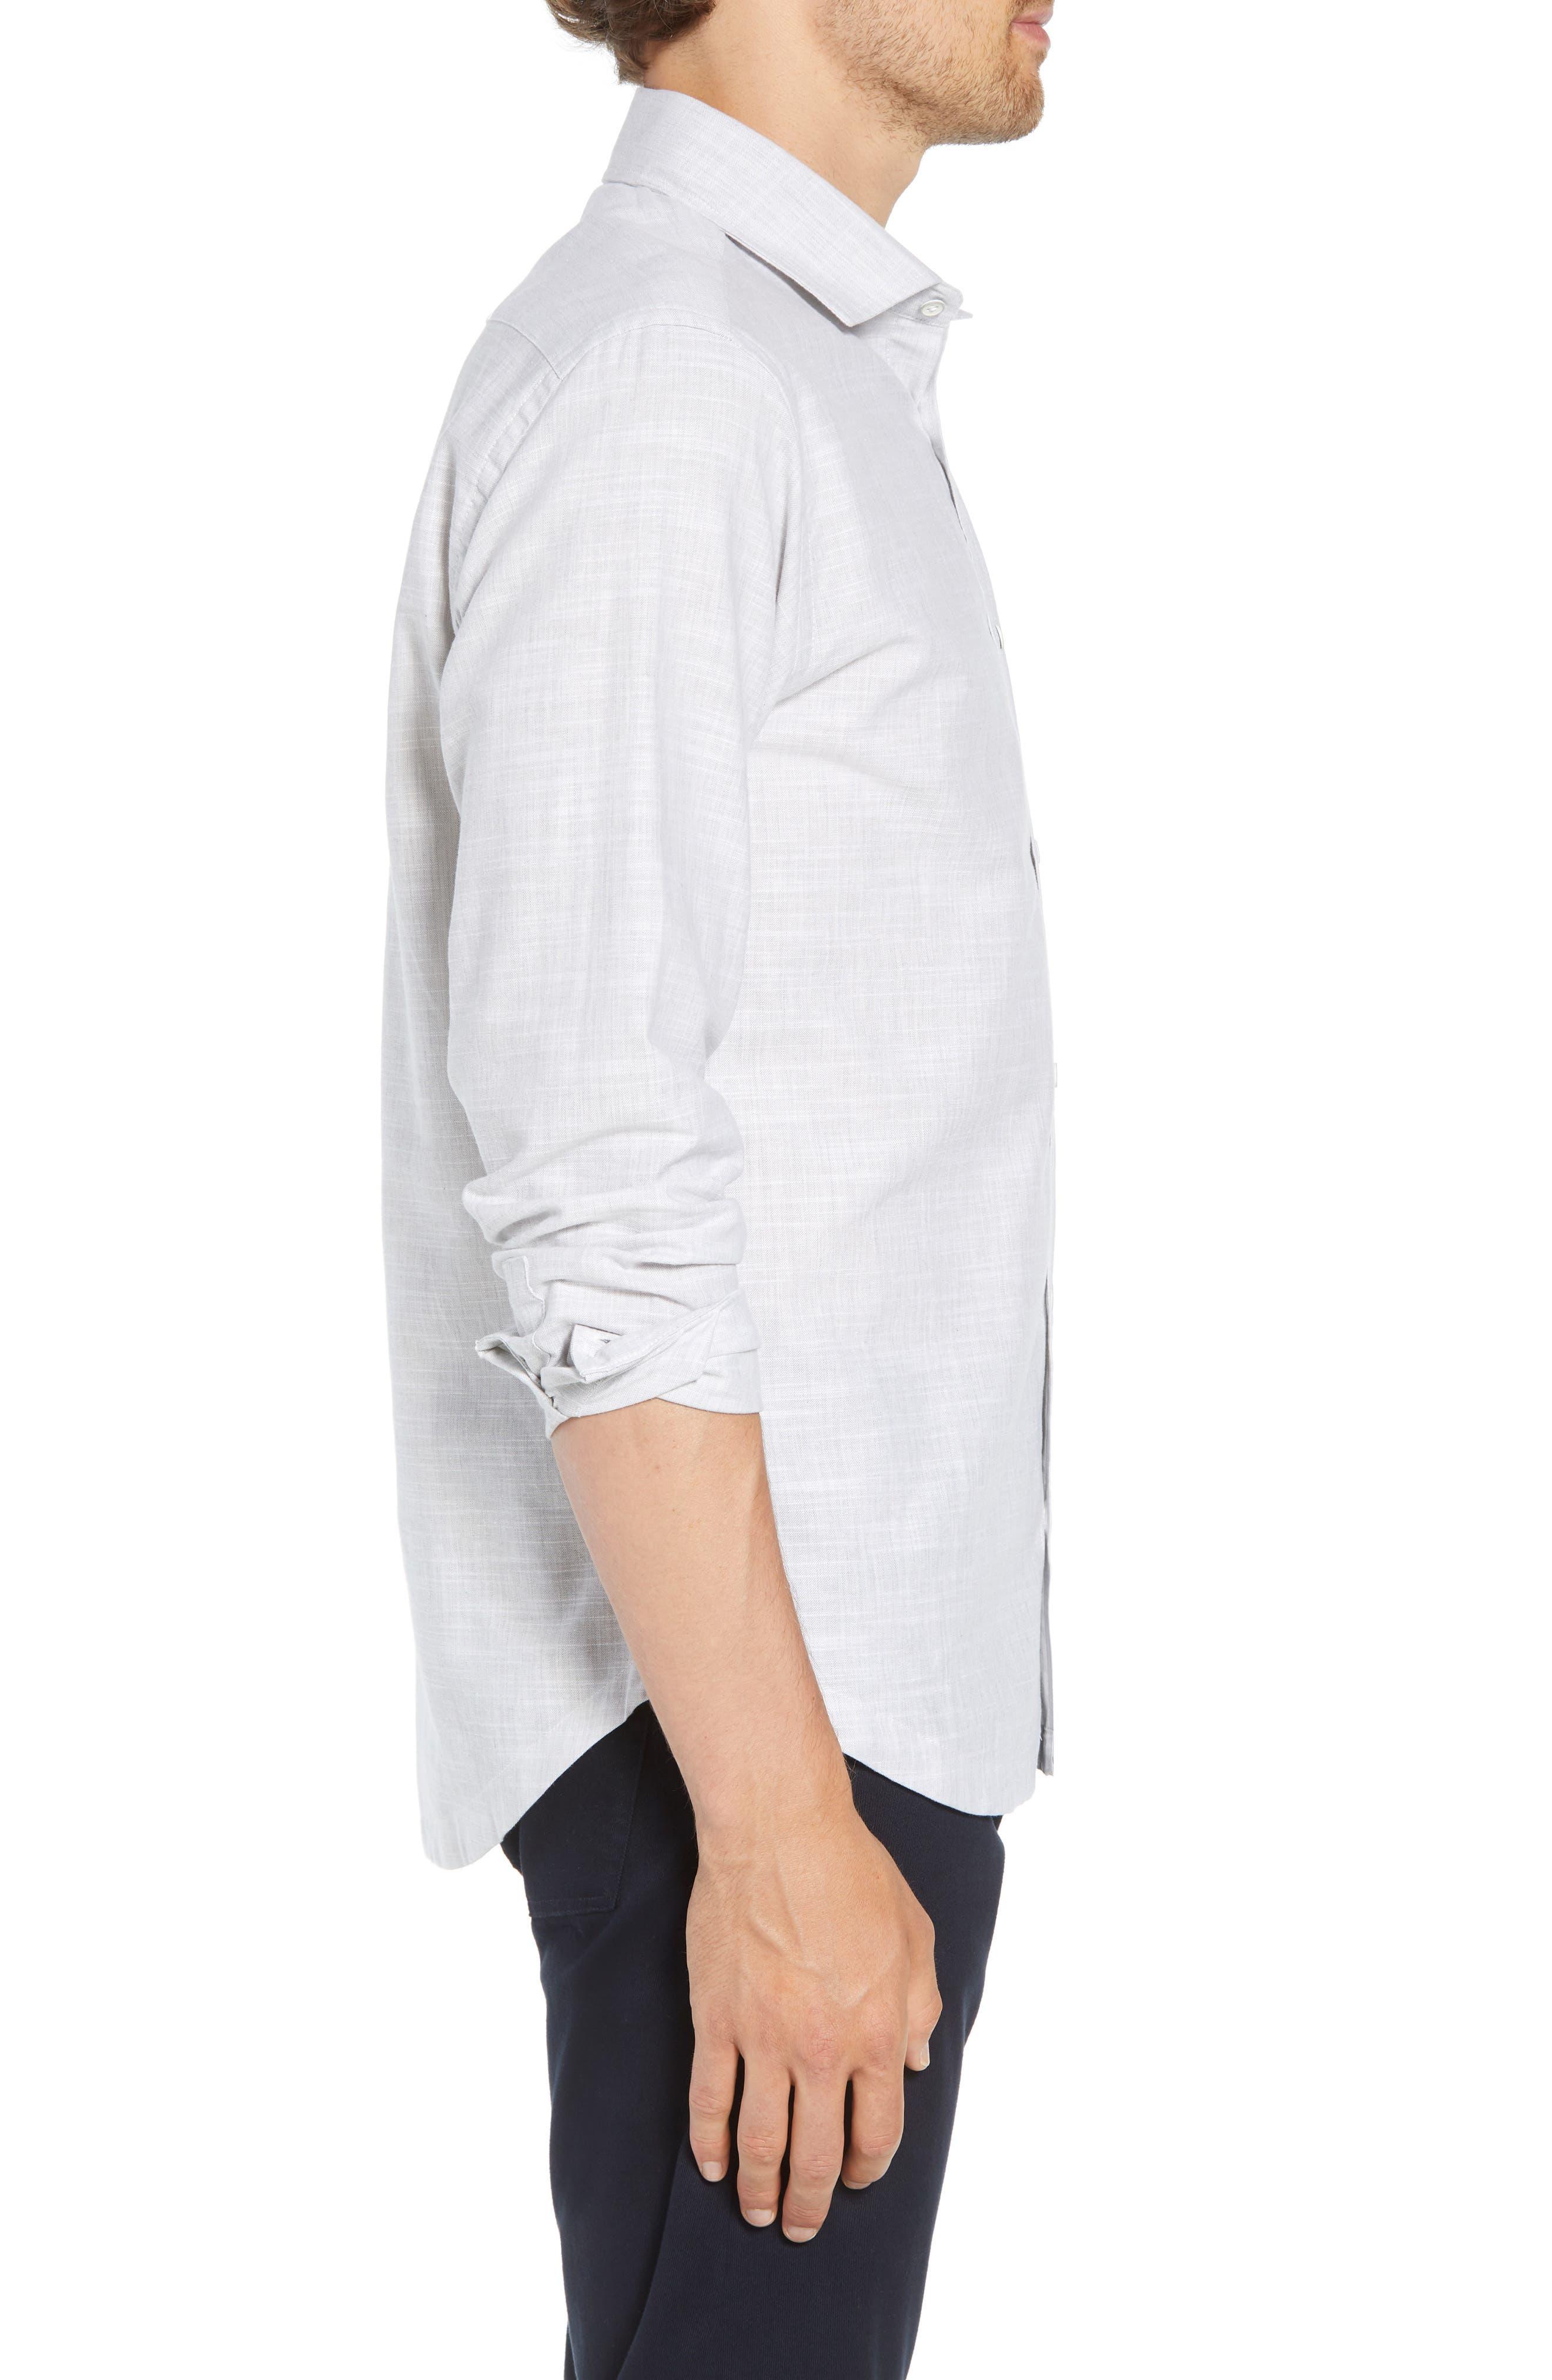 Rugger Regular Fit Sport Shirt,                             Alternate thumbnail 4, color,                             LIGHT GREY